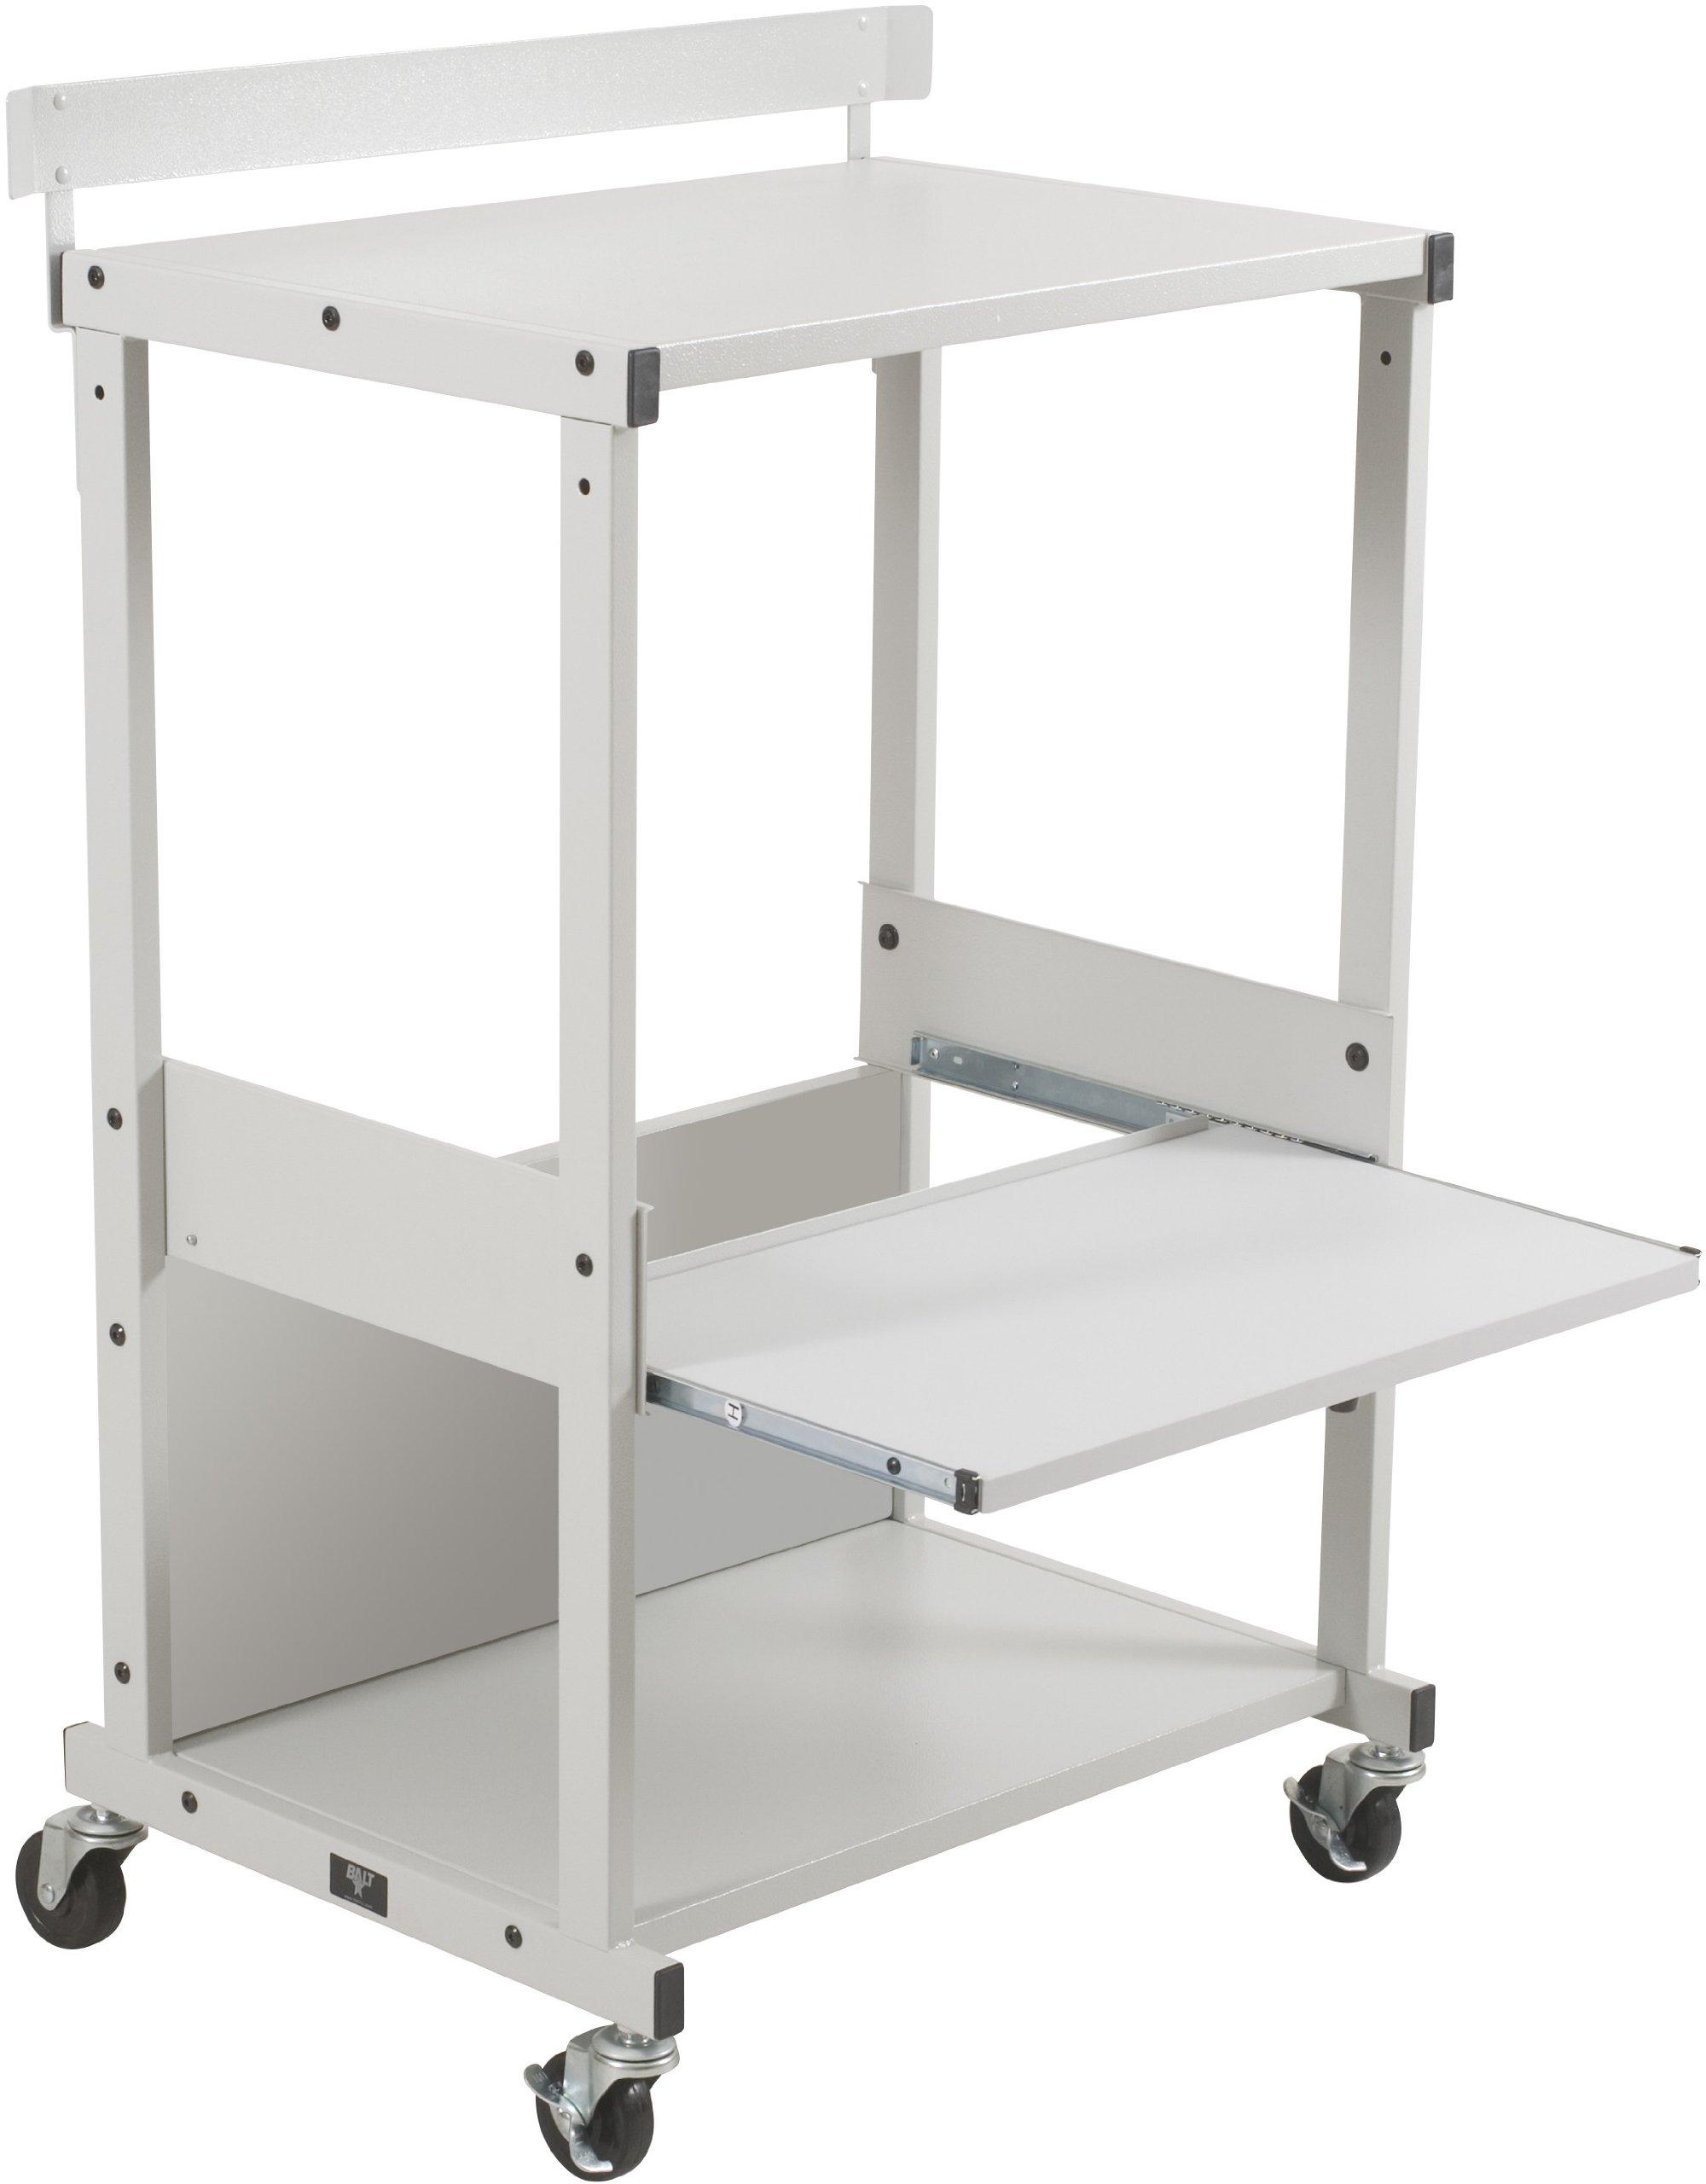 Balt Max Stax Stand Up Workstation Or Dual Printer/Fax Machine Stand, Gray Podwer Coat Finish, 42.5'' H x 25.13'' W x 20'' D (25983) by Balt